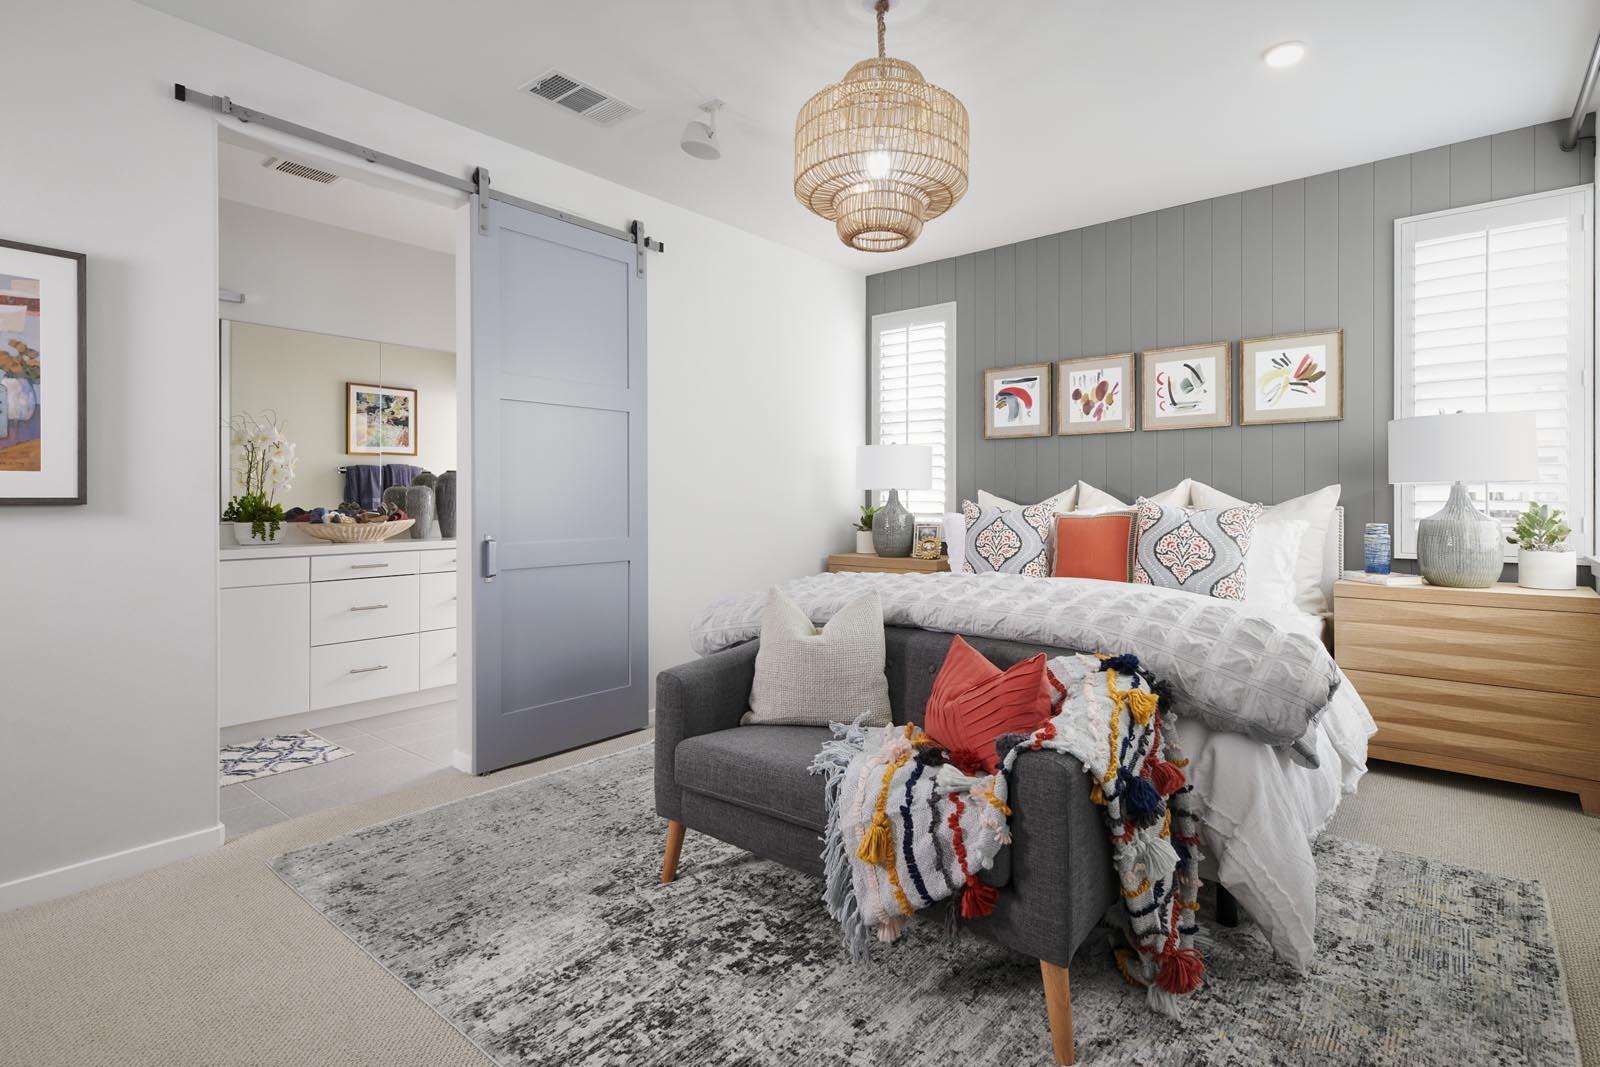 Master Bedroom | Residence 1 | Enliven | New Homes in Rancho Cucamonga, CA | Van Daele Homes